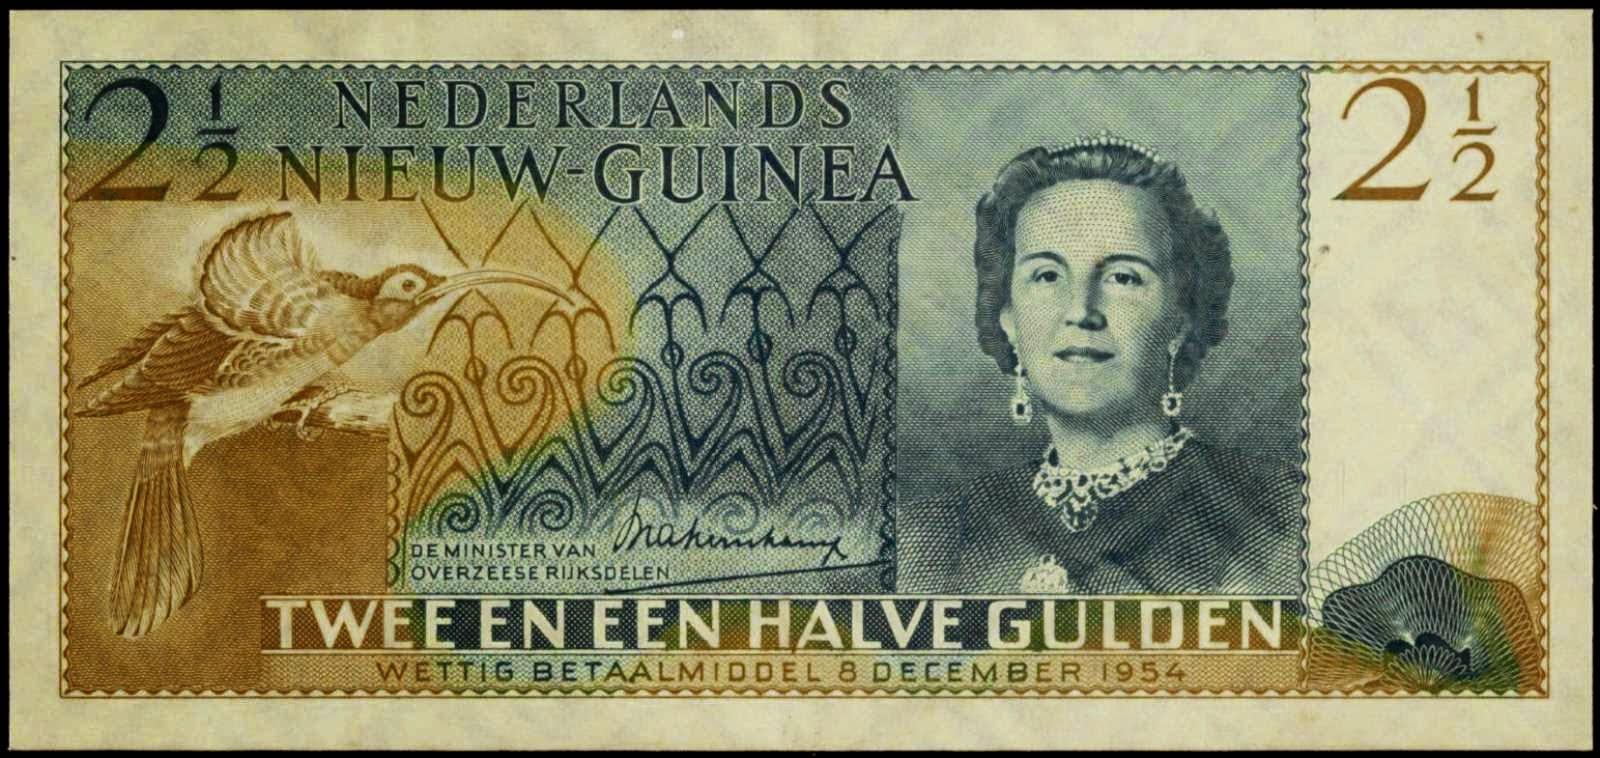 Netherlands New Guinea banknotes 2 1/2 Gulden bank note 1954 Queen Juliana